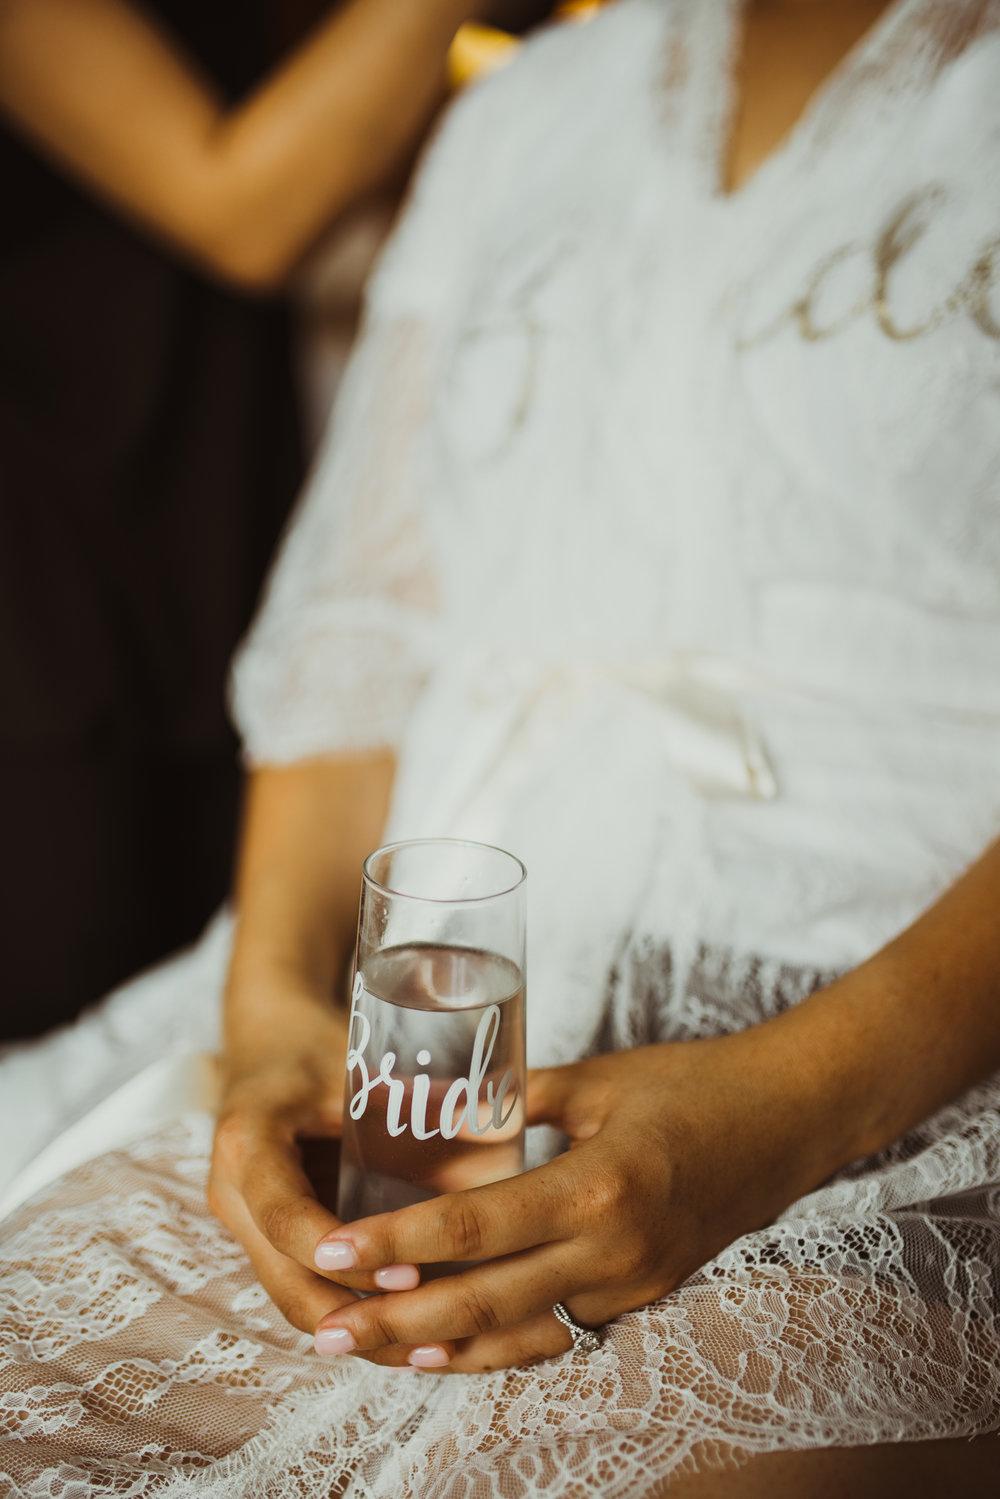 ©Isaiah + Taylor Photography - Brendan + Stefana, Quail Haven Farm Wedding, Vista-04.jpg